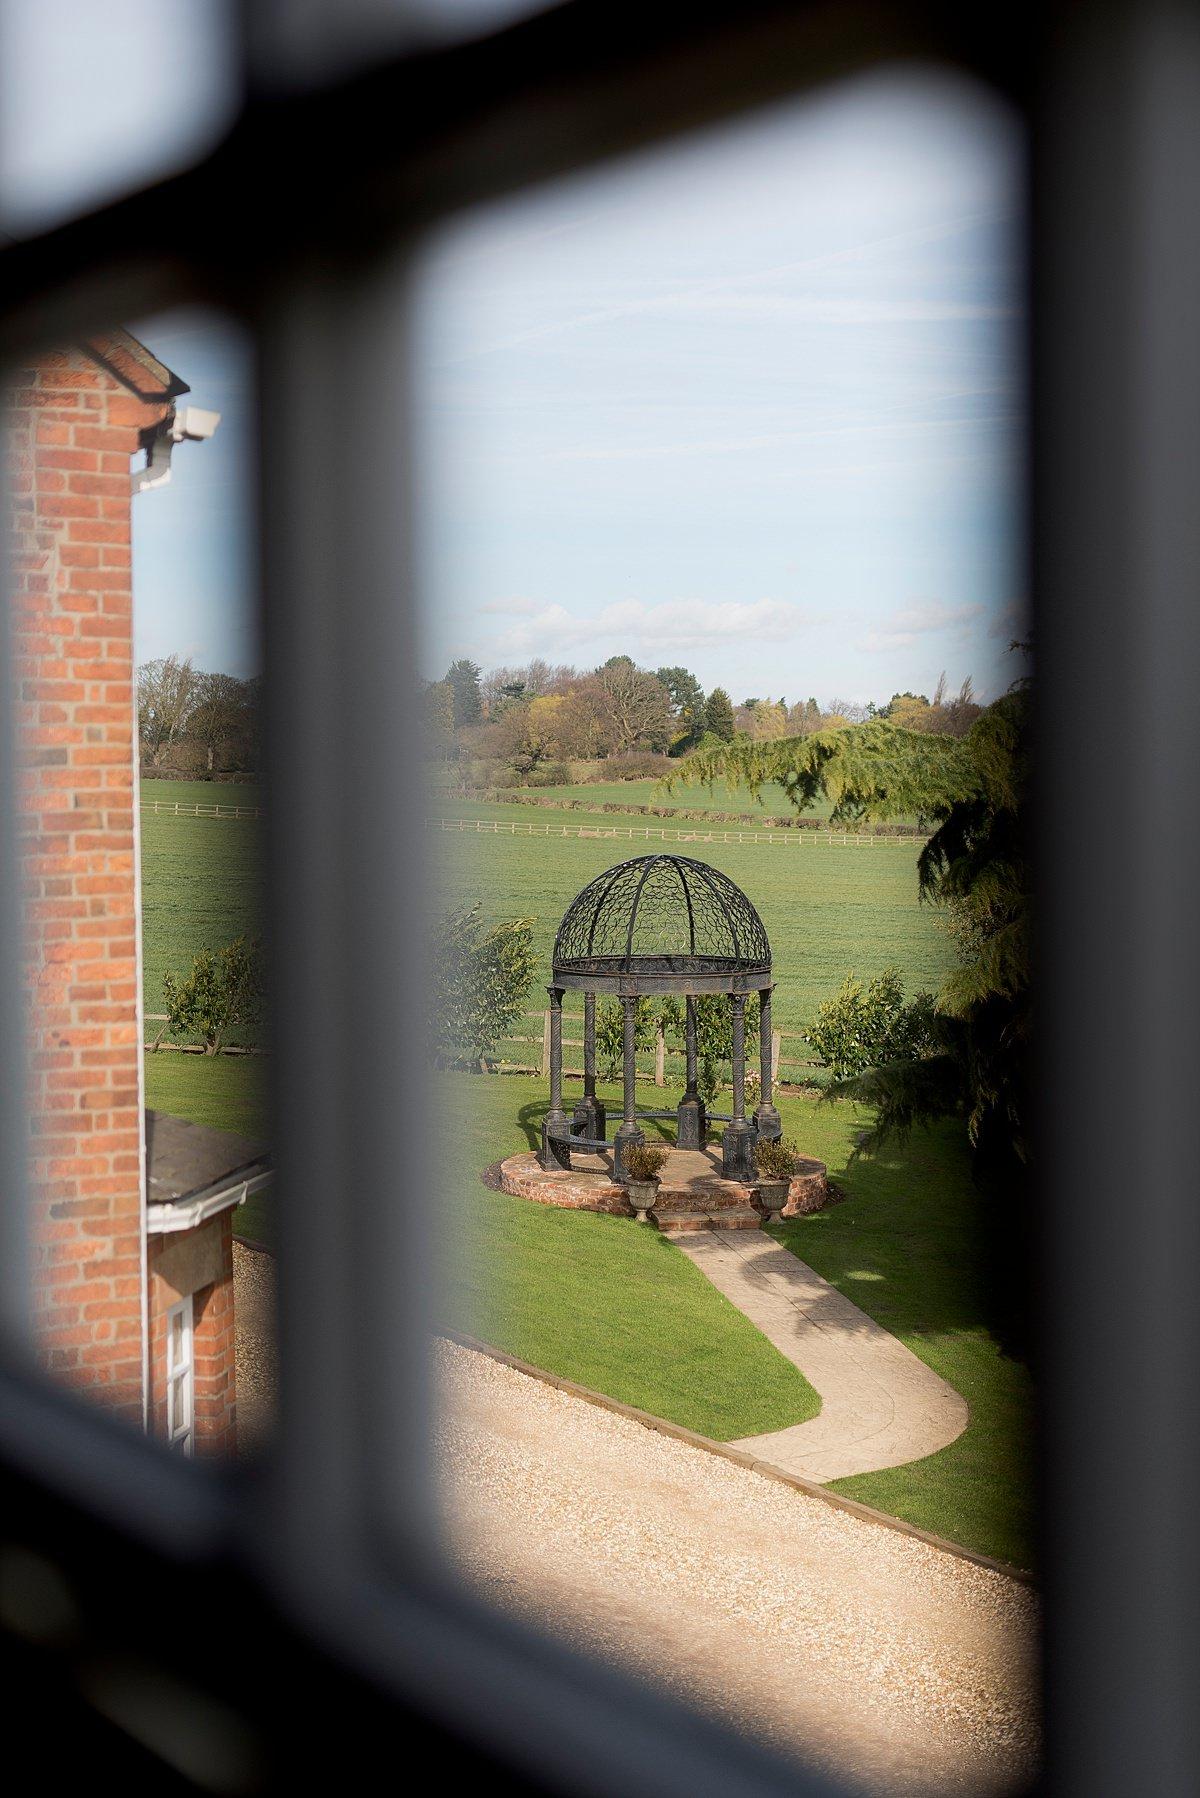 Swancar Farm Wedding Photography view from window